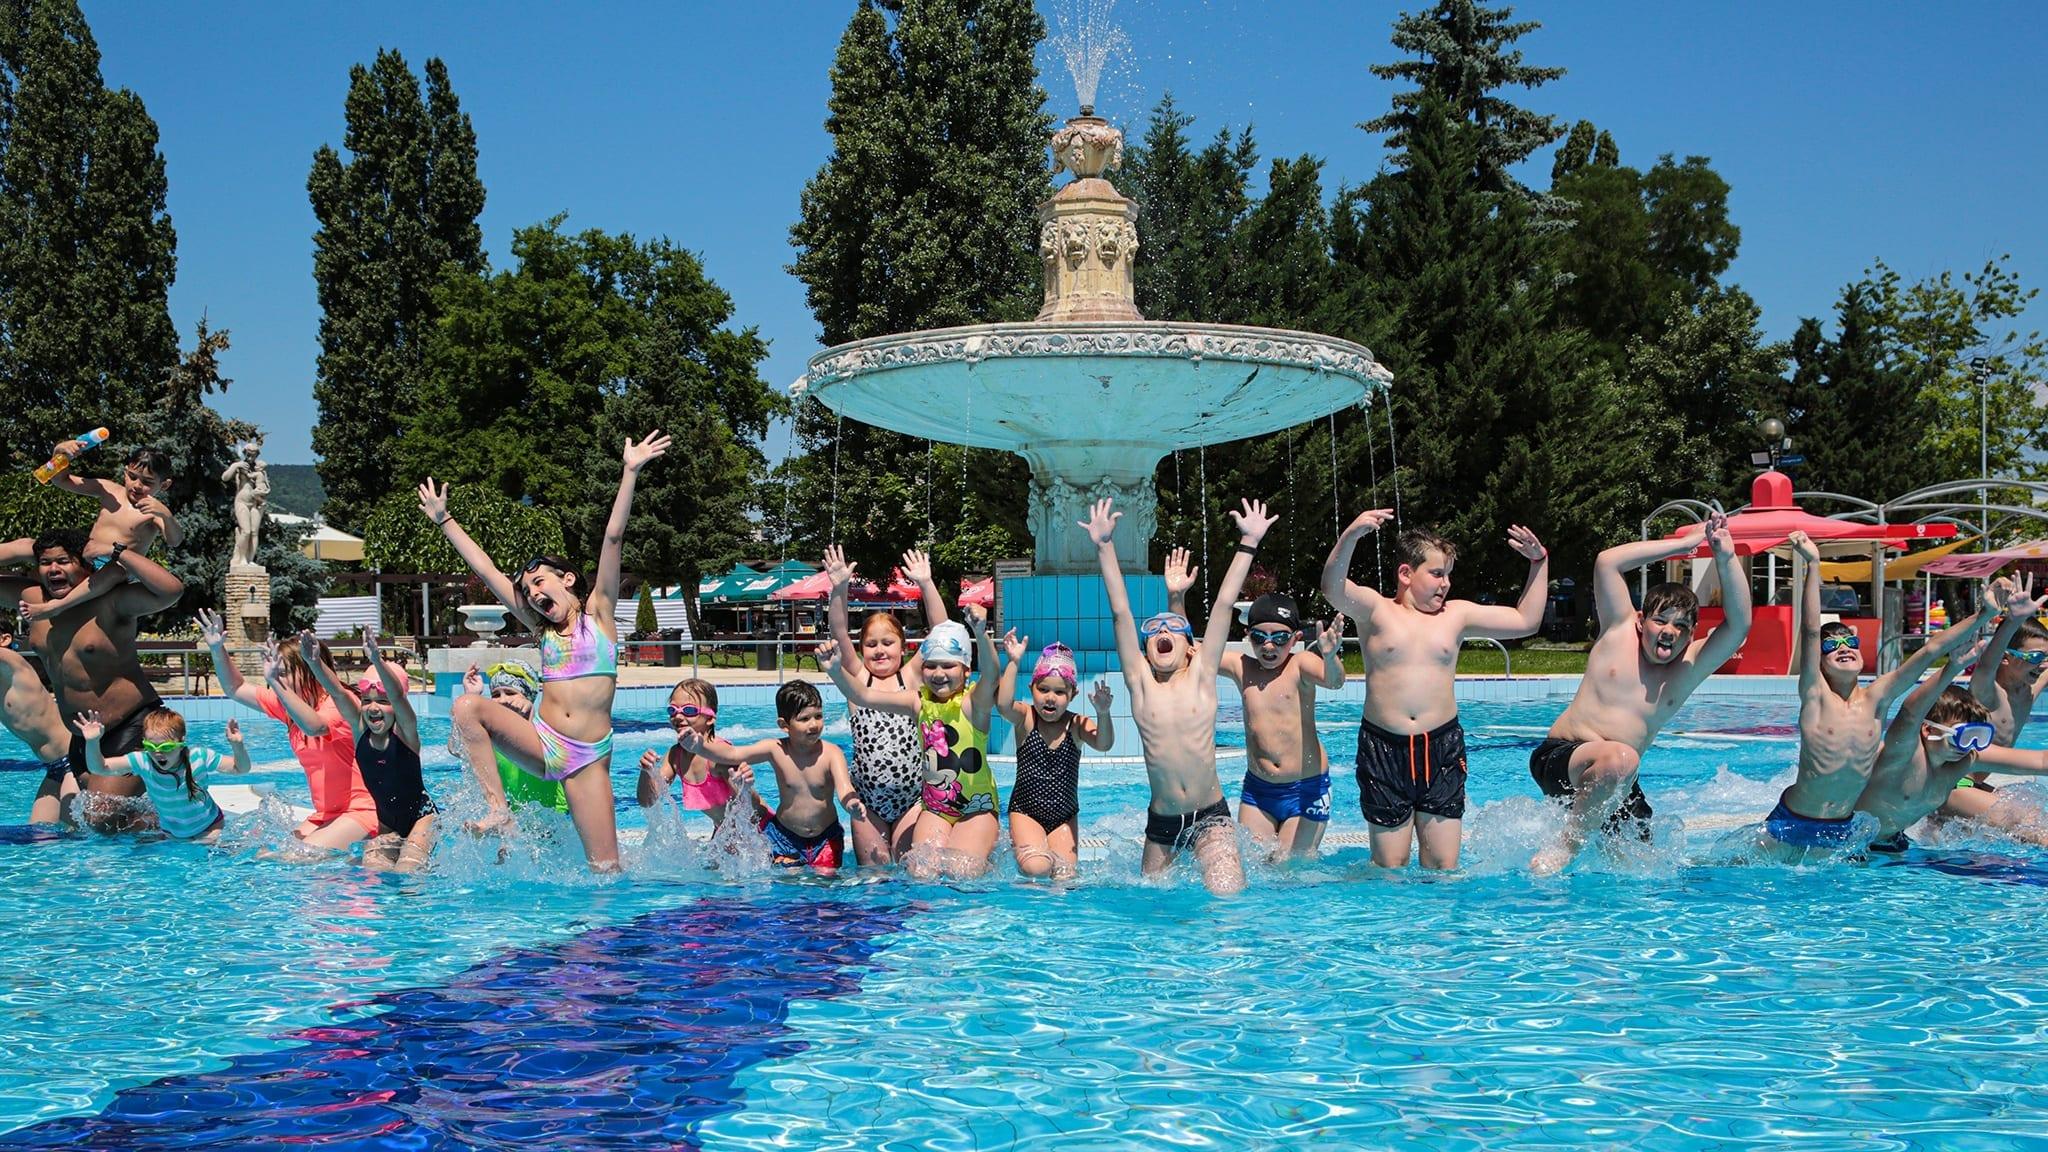 Palatinus úszótábor 2020 nyár B.B. Swimmingsport